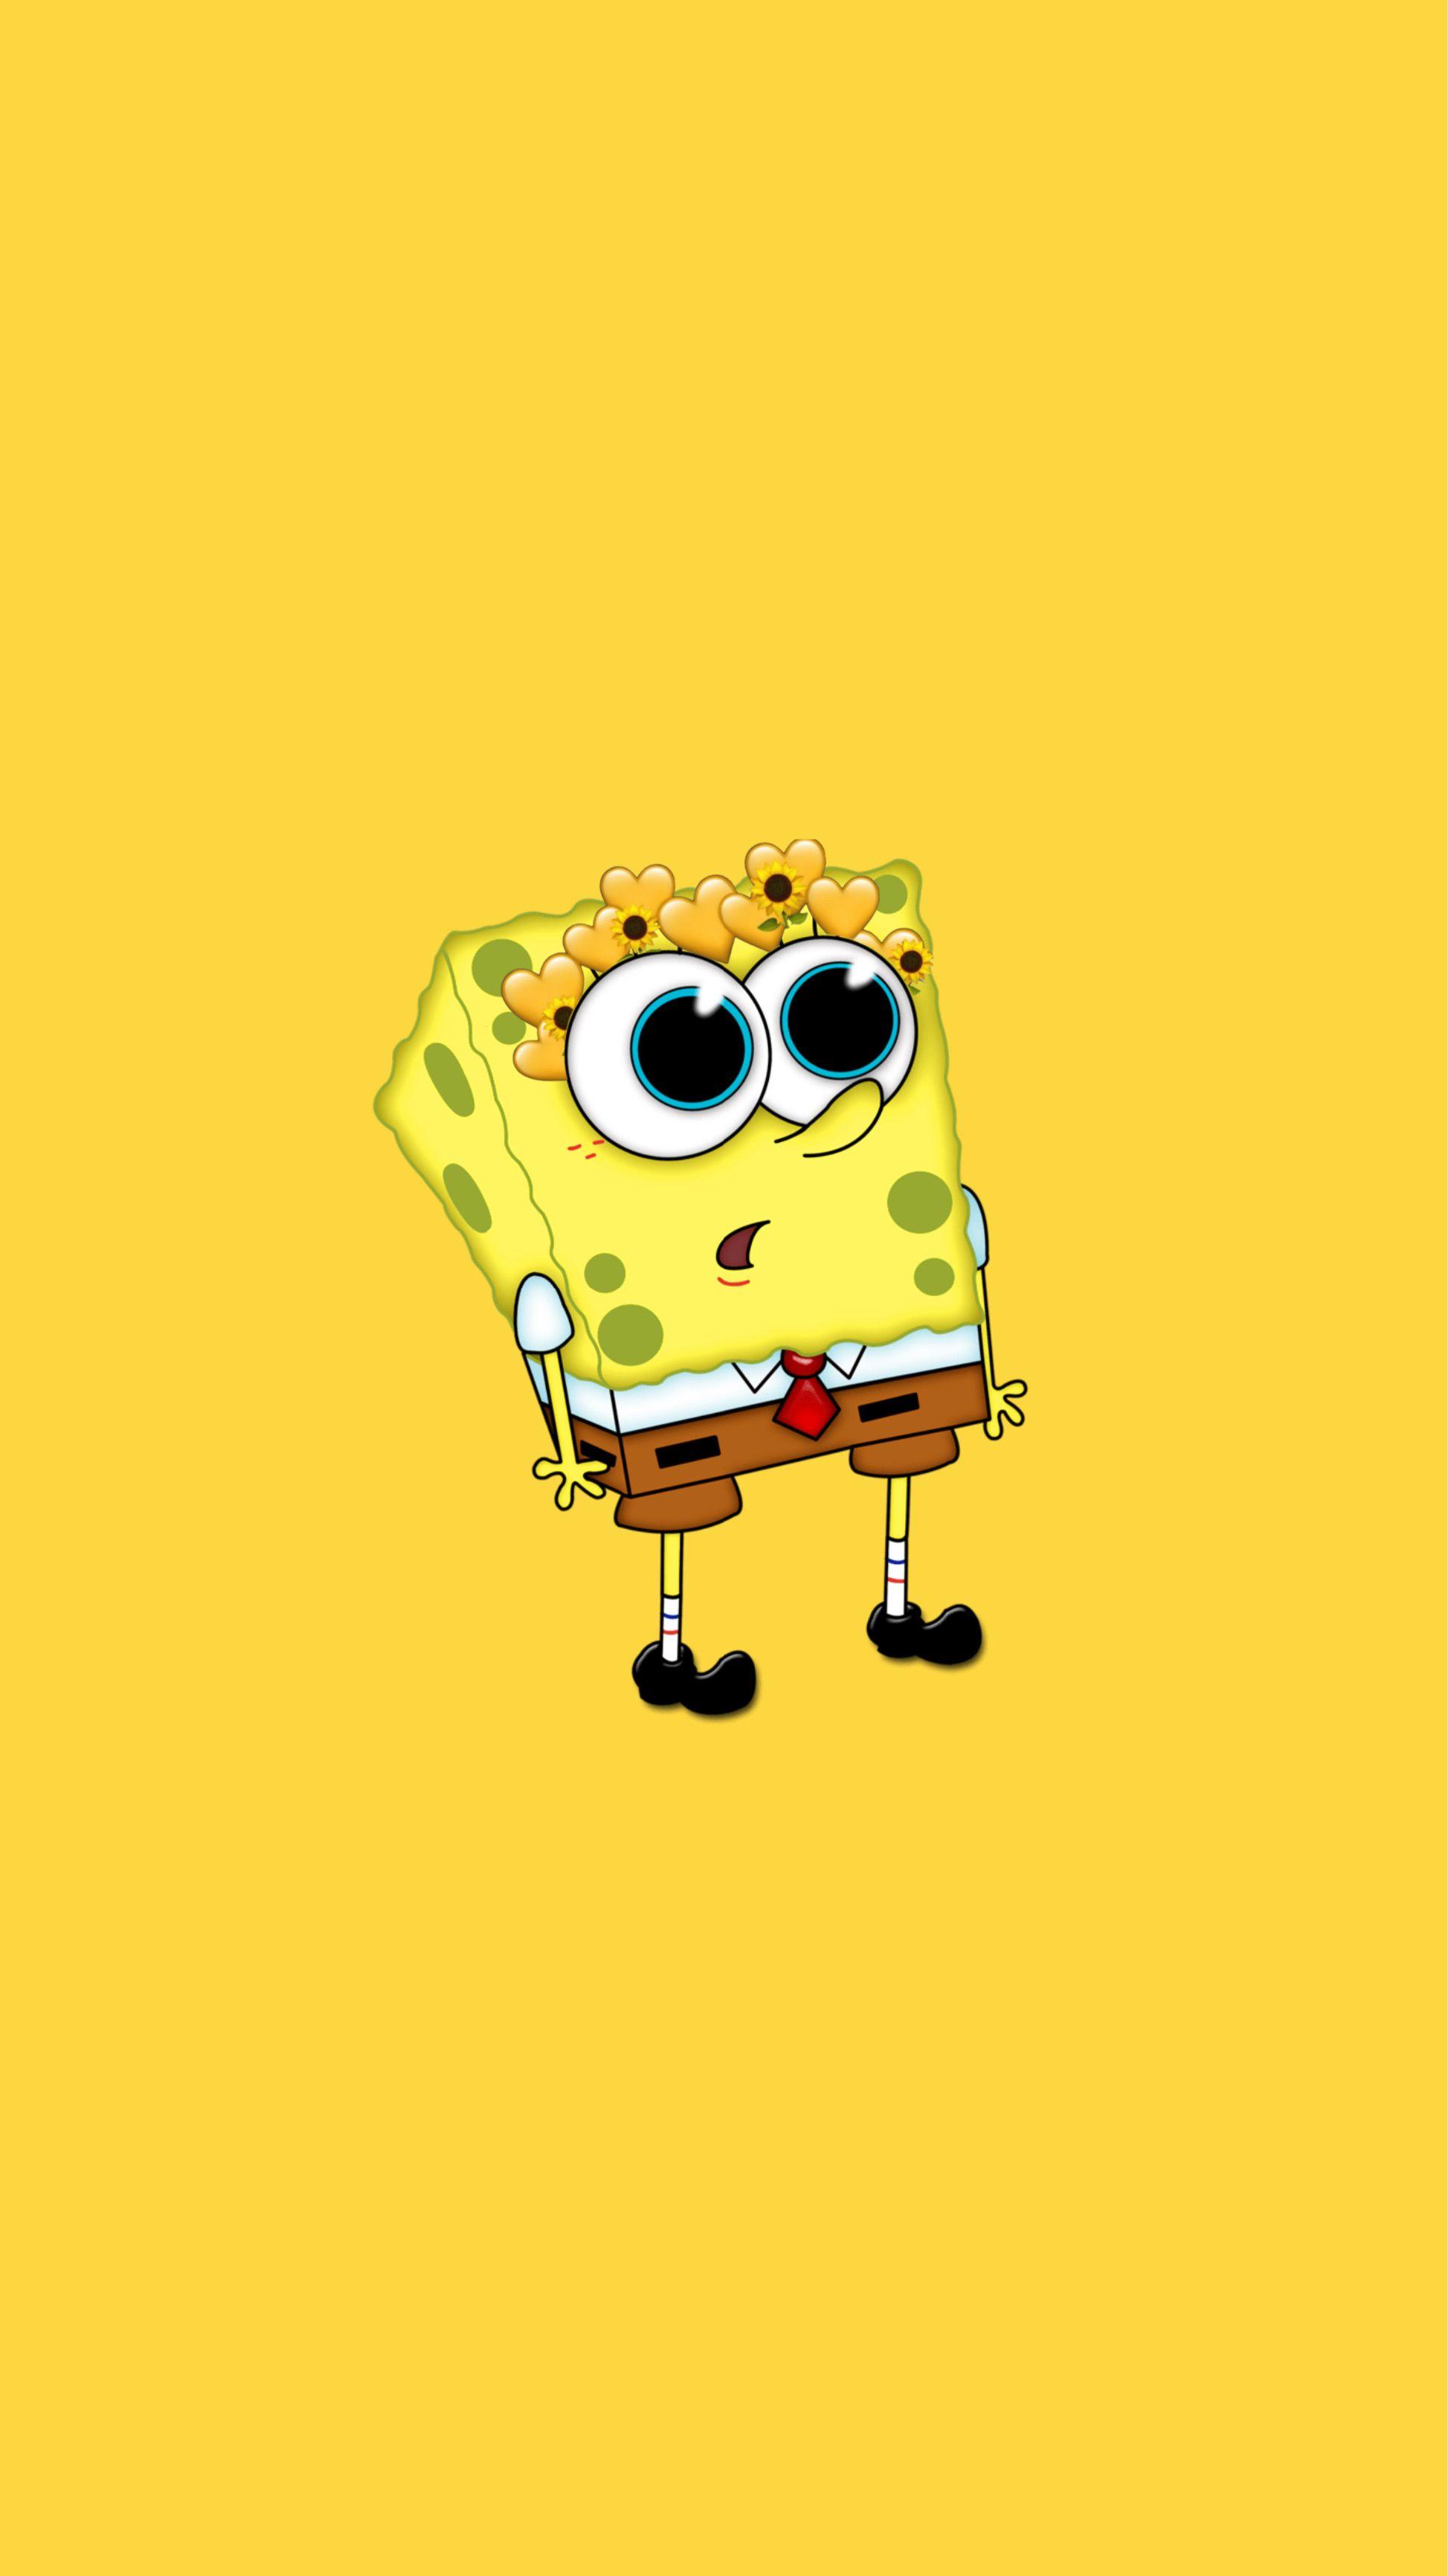 Spongebob Wallpaper 4 Spongebob Wallpaper Spongebob Iphone Wallpaper Cartoon Wallpaper